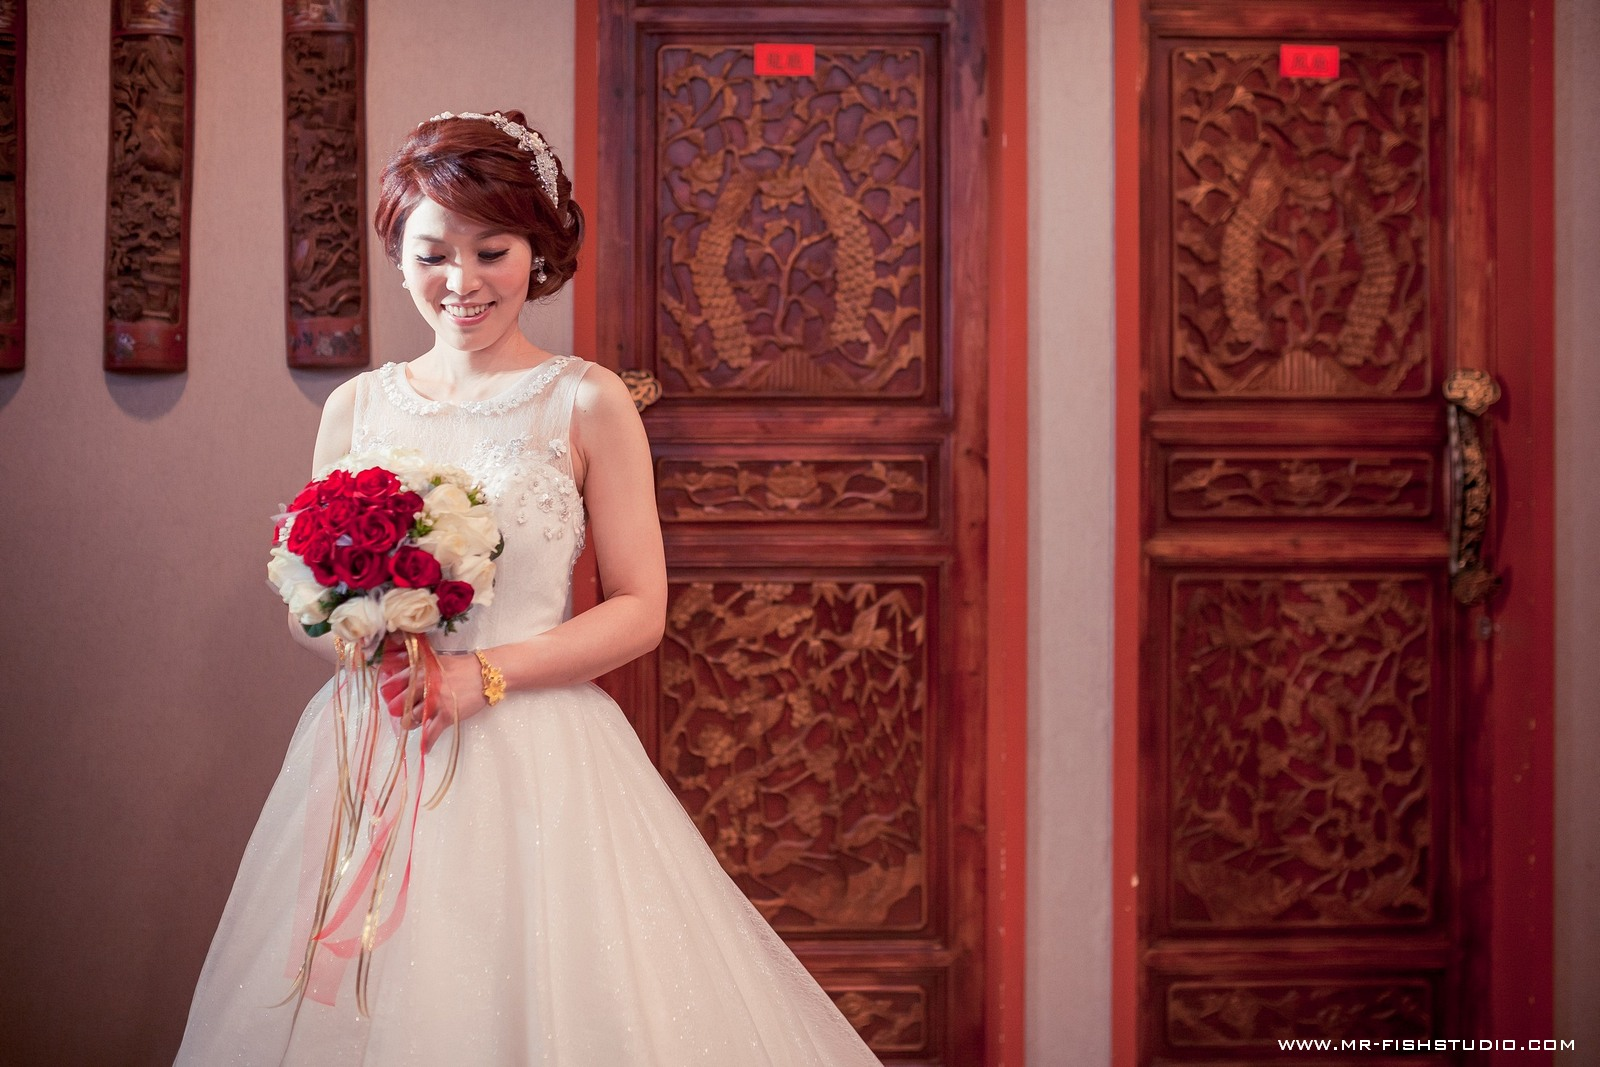 【Wedding】安智+惠祺婚禮精選